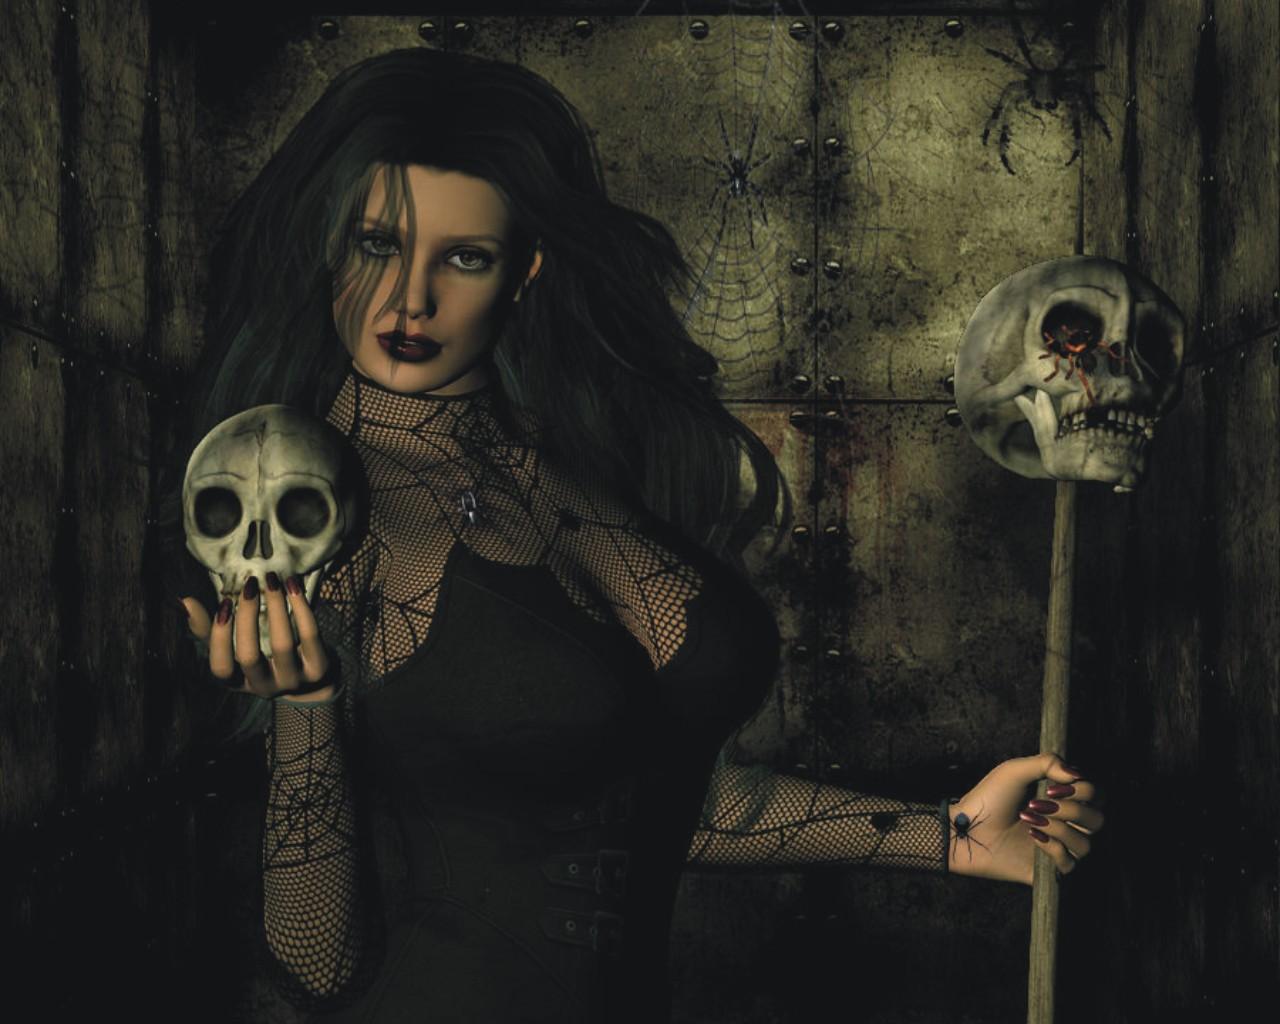 http://1.bp.blogspot.com/-ErhIRNfhCxM/T6KsHeSbzNI/AAAAAAAABsY/ecKgEMYRyQY/s1600/Evil-Witch-Wallpaper.jpg